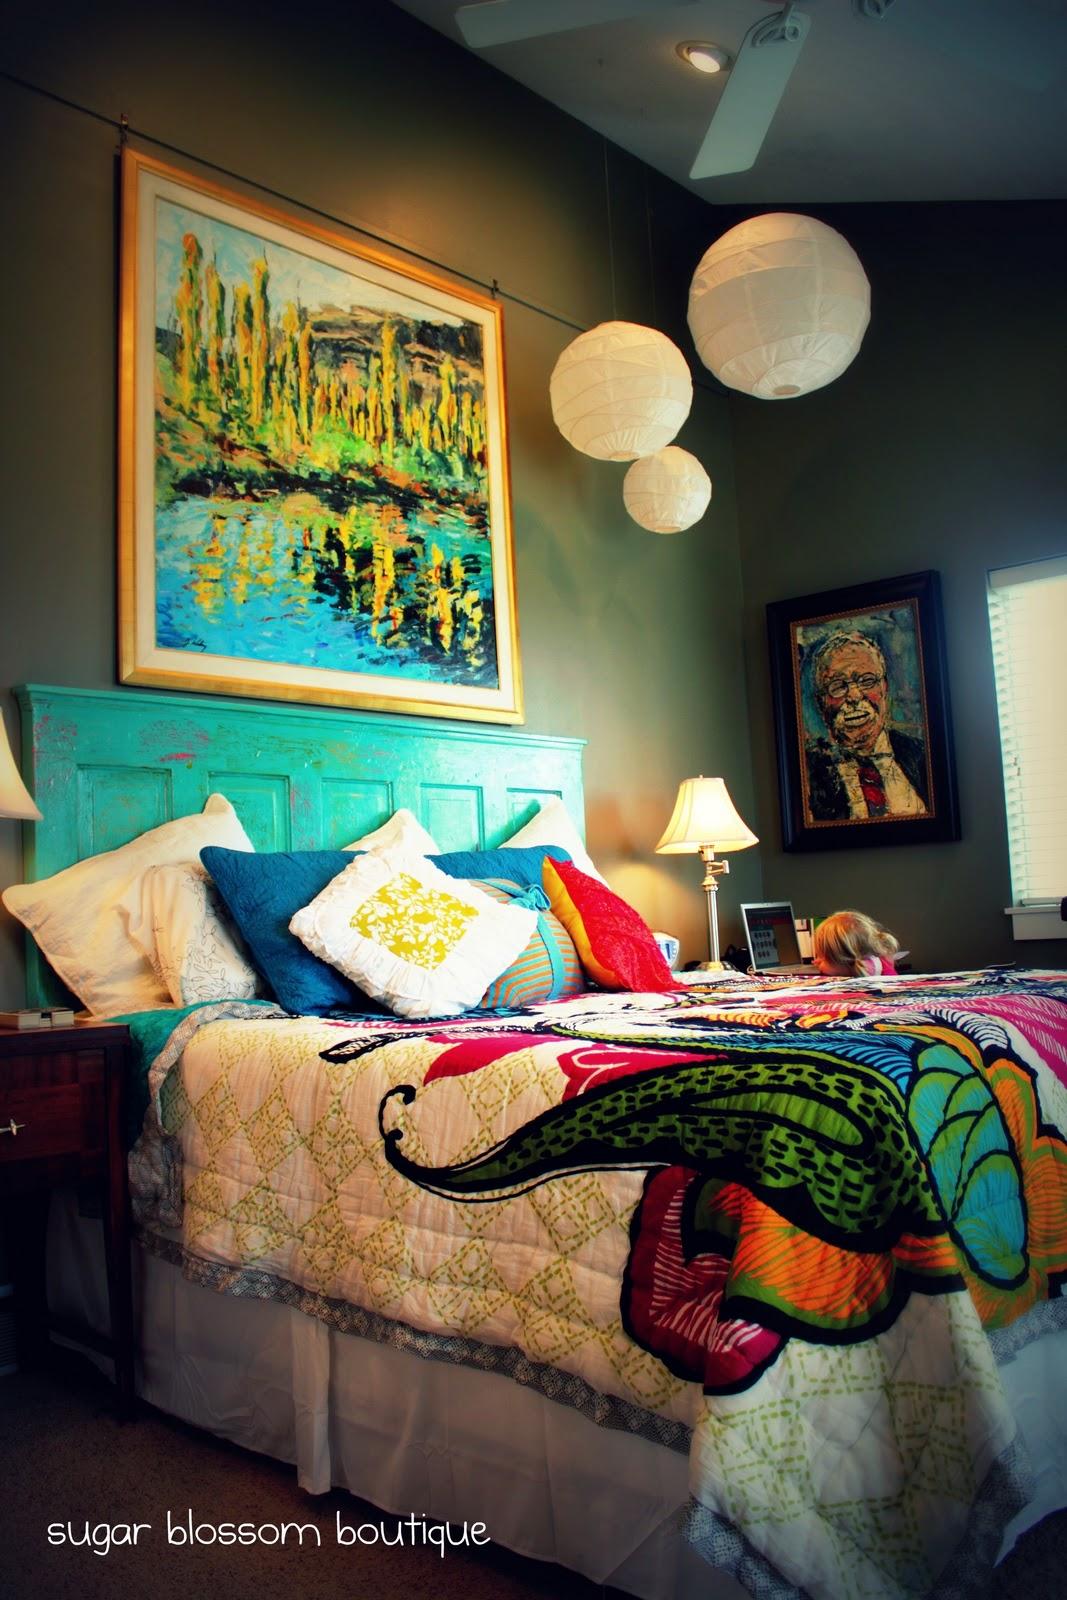 Sugar Blossom Boutique: diy upcycled pillows - photo#25